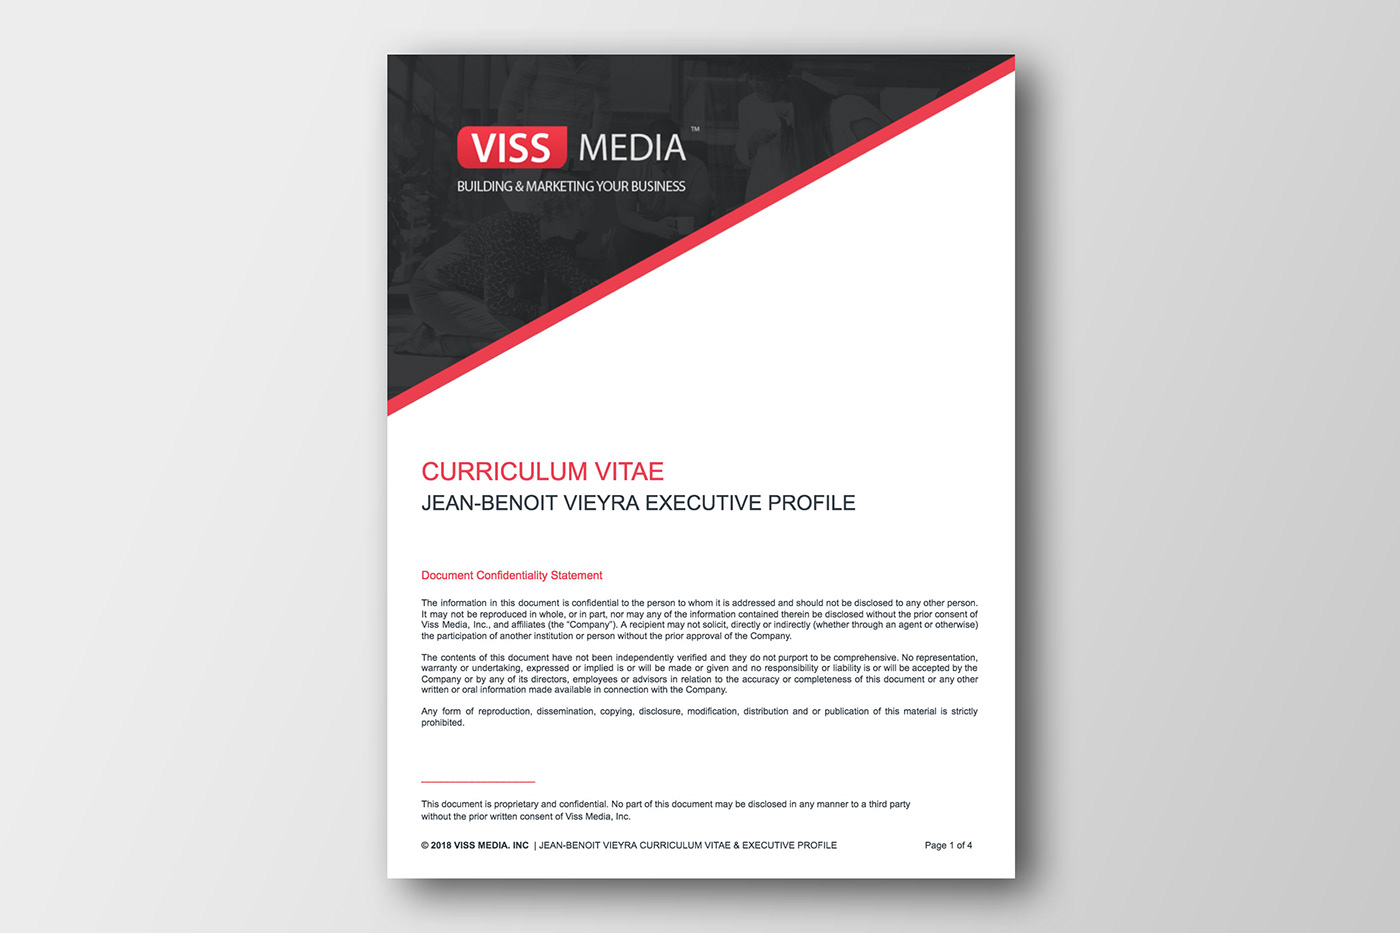 Curriculum Vitae Resume Design Template On Behance